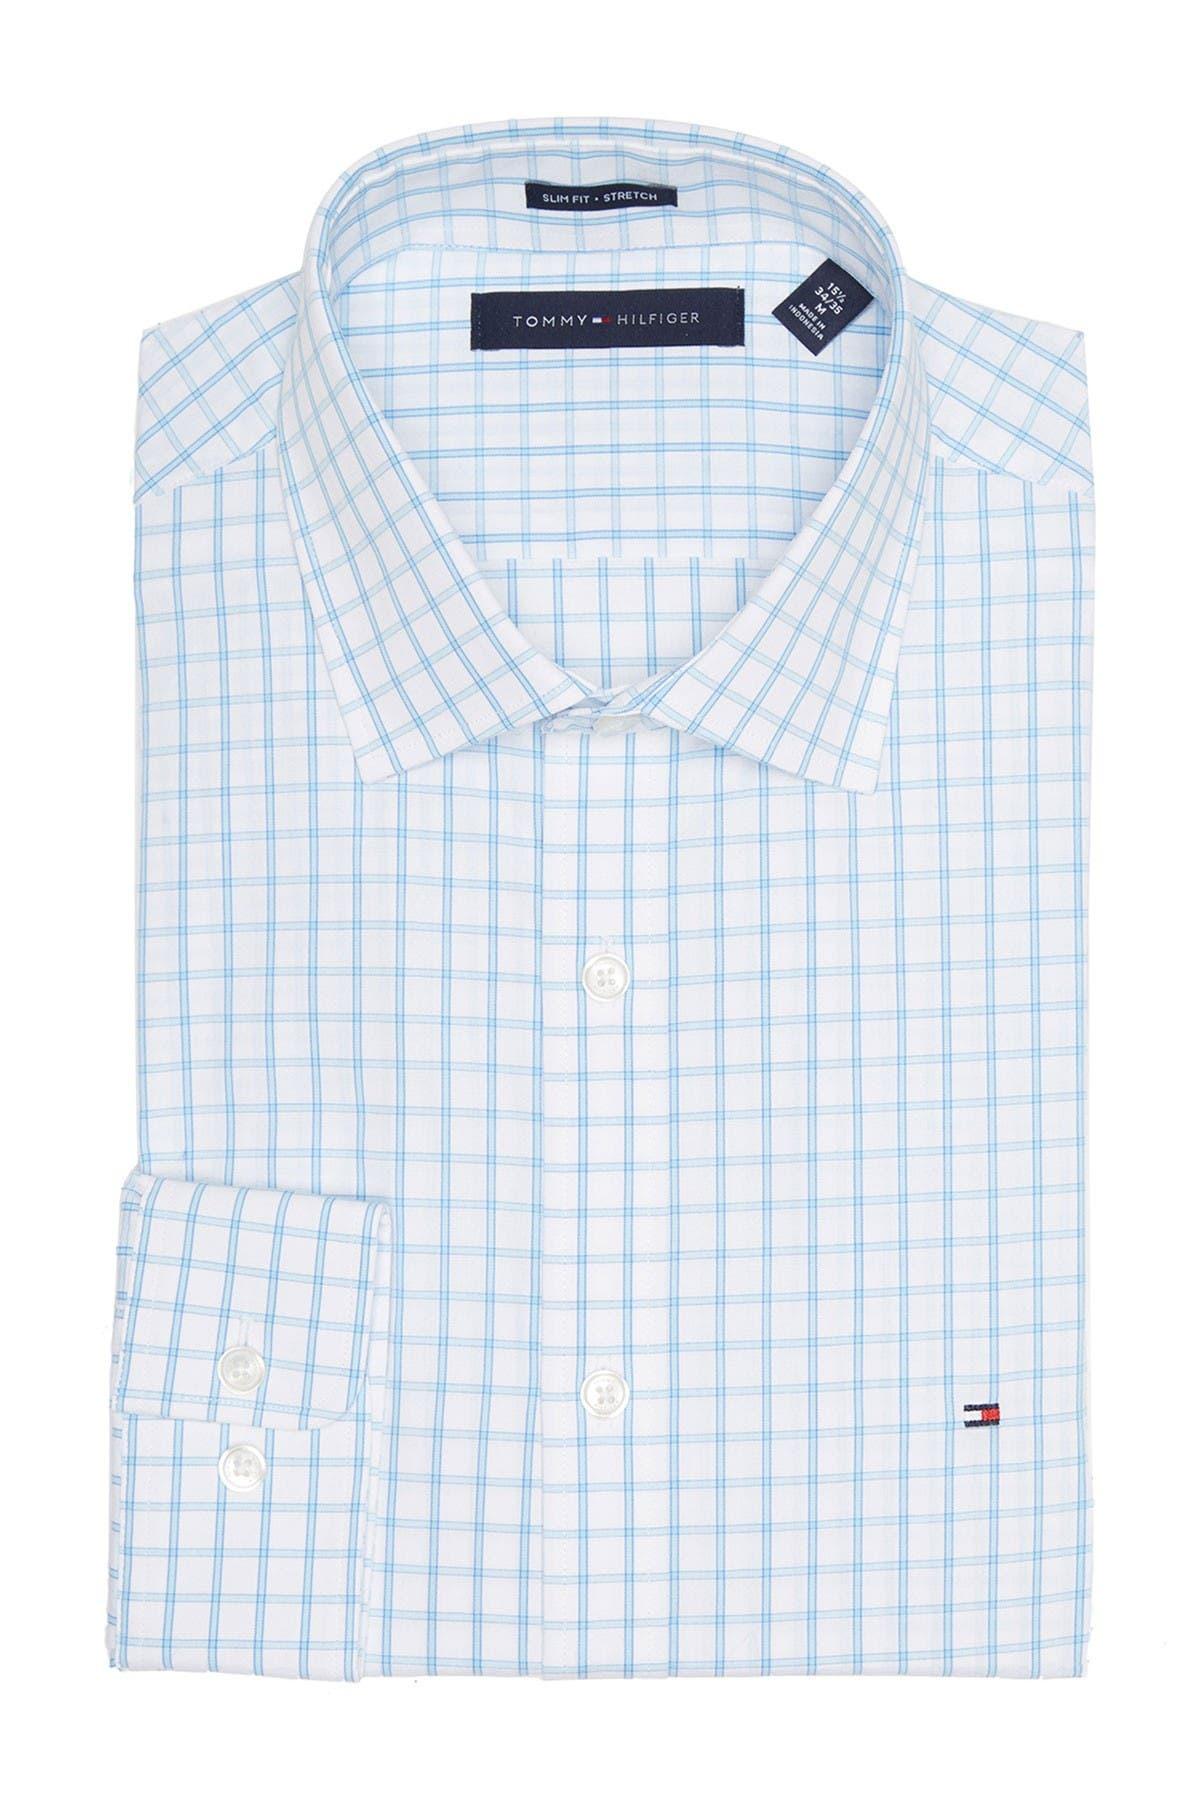 Tommy Hilfiger Windowpane Print Stretch Slim Fit Shirt